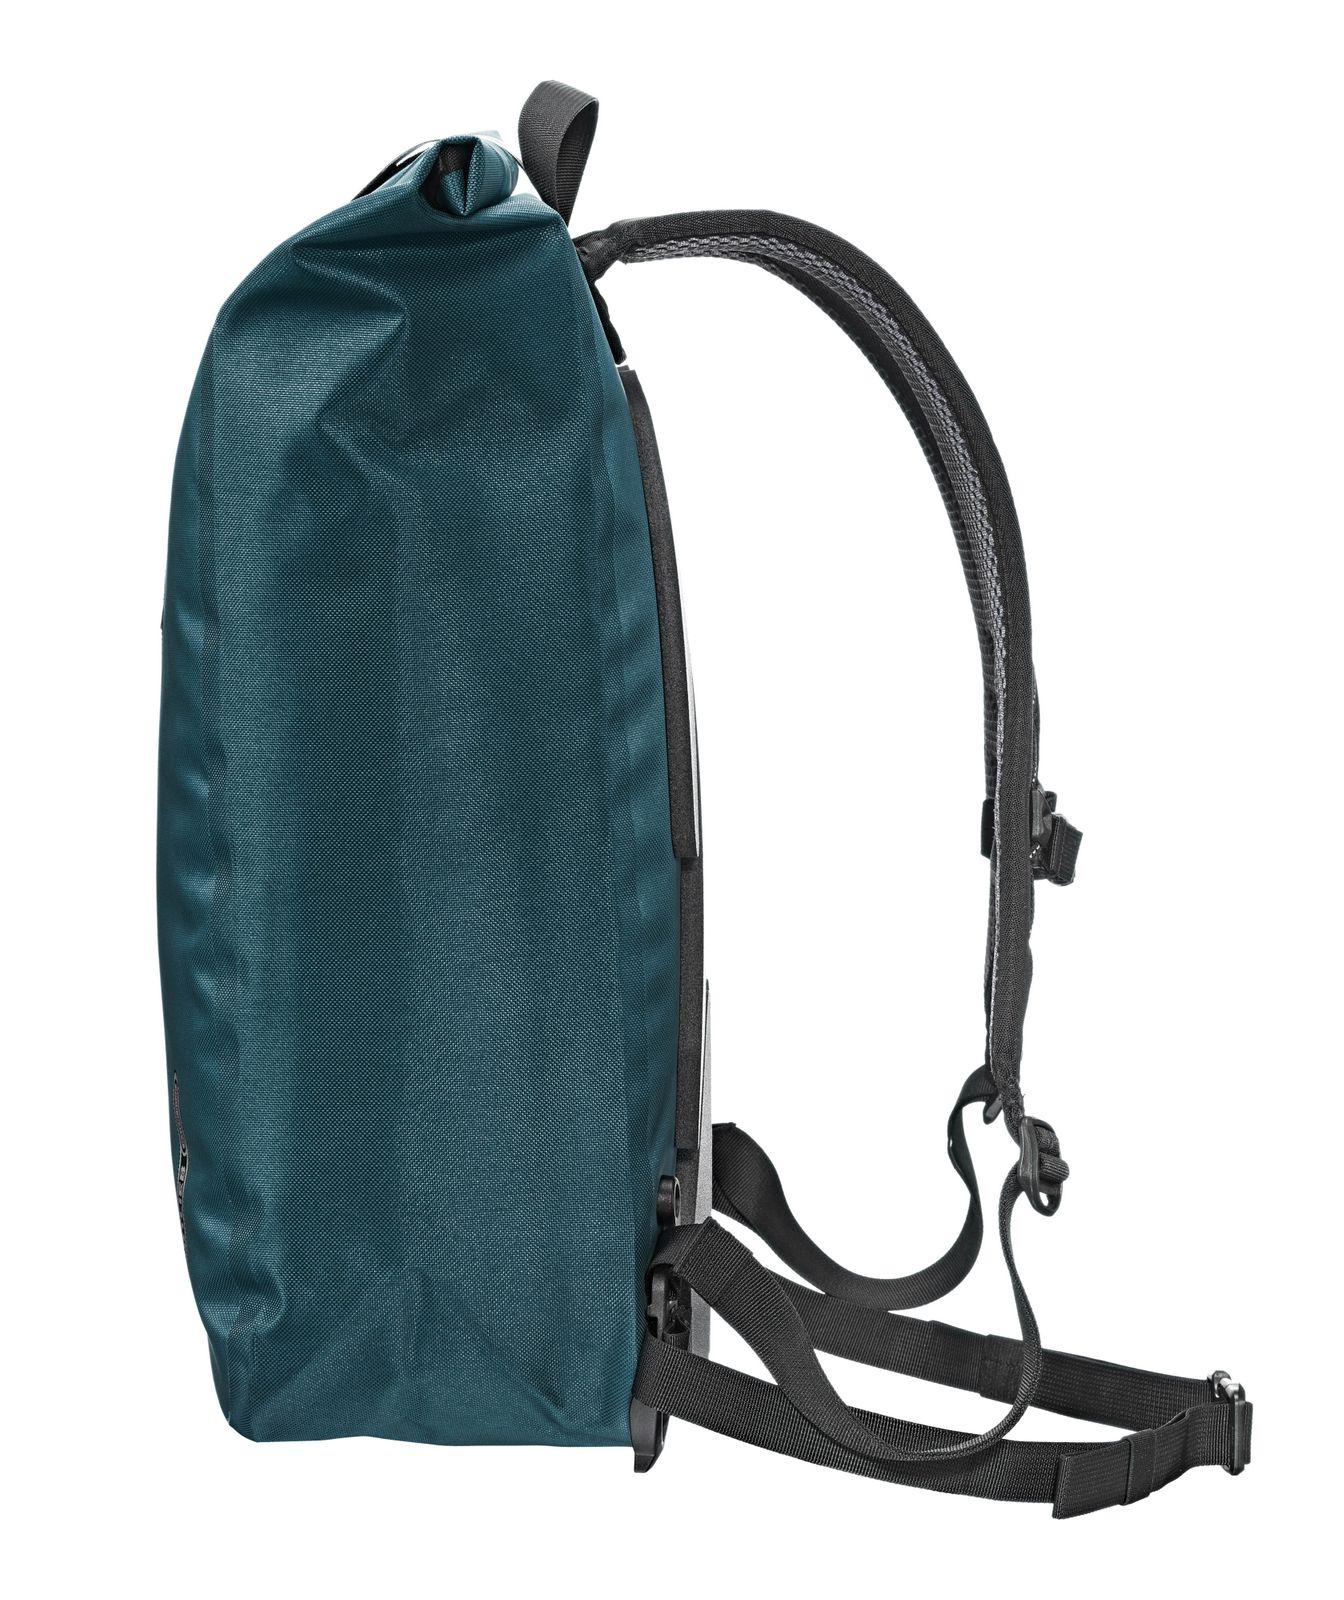 ORTLIEB Velocity PS City Backpack 23L Petrol